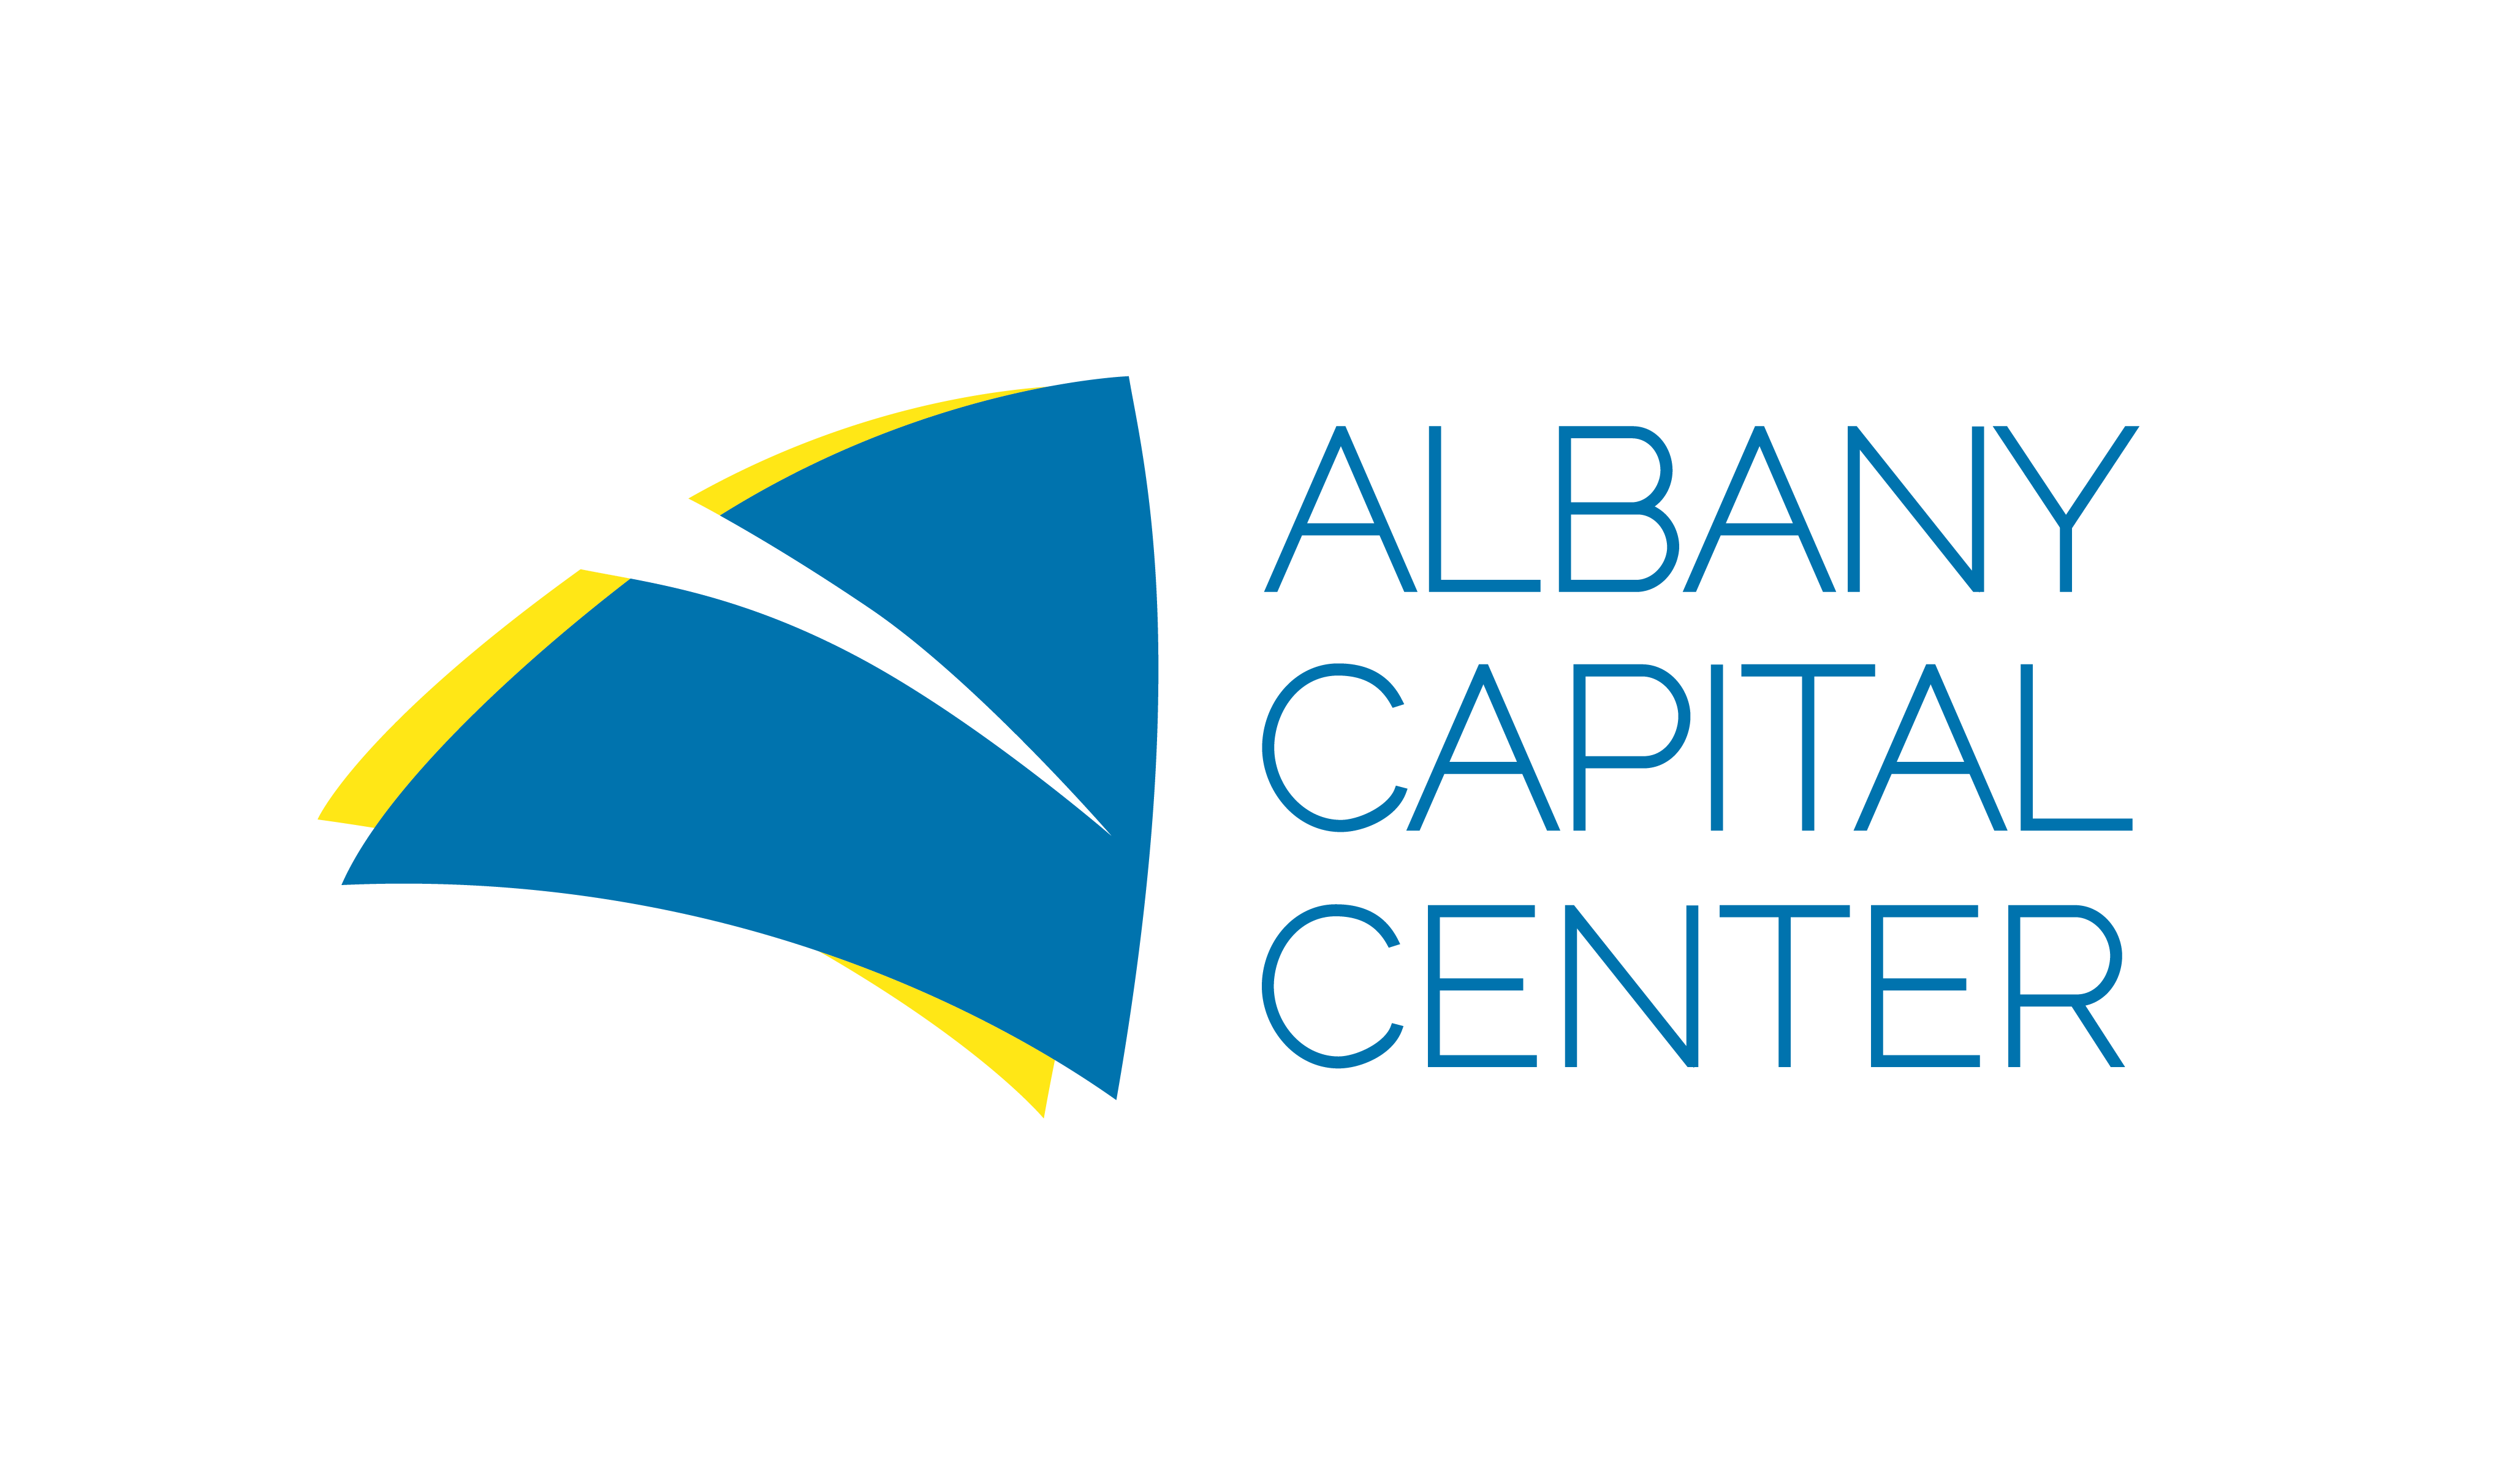 Albany Capital Center, SMG 2